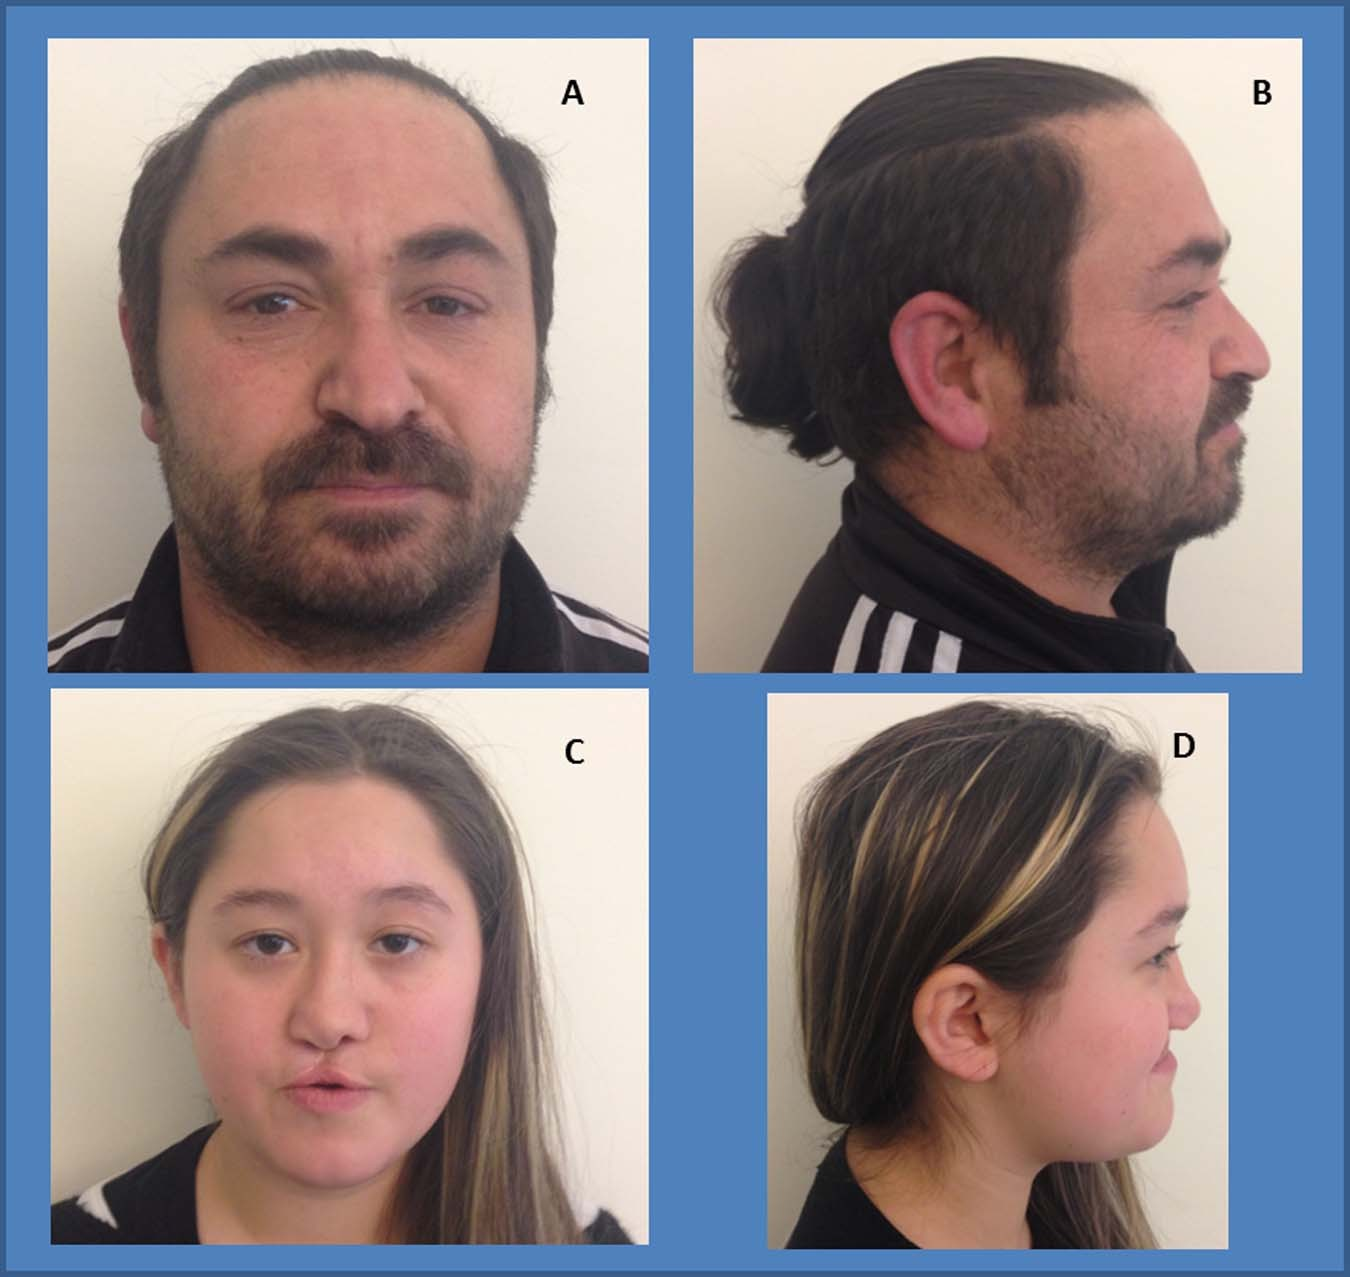 Schilbach–Rott syndrome associated with 9q22 32q22 33 duplication